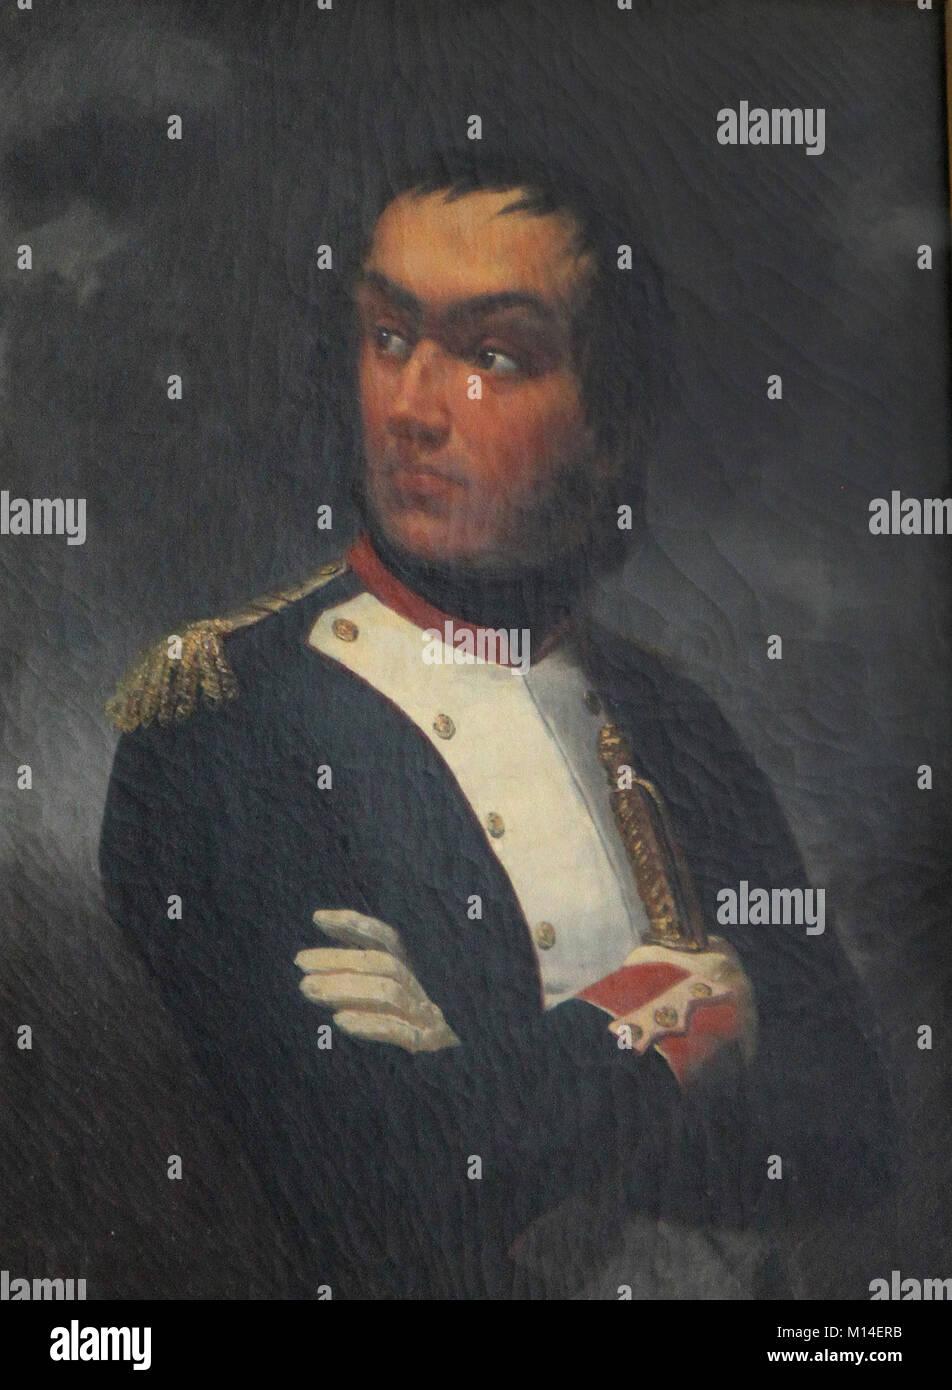 Oil canvas painting portrait of Lieutenant Colonel Marshal, Duke of Reggio Nicolas Charles Oudinot by Auguste Raymond - Stock Image